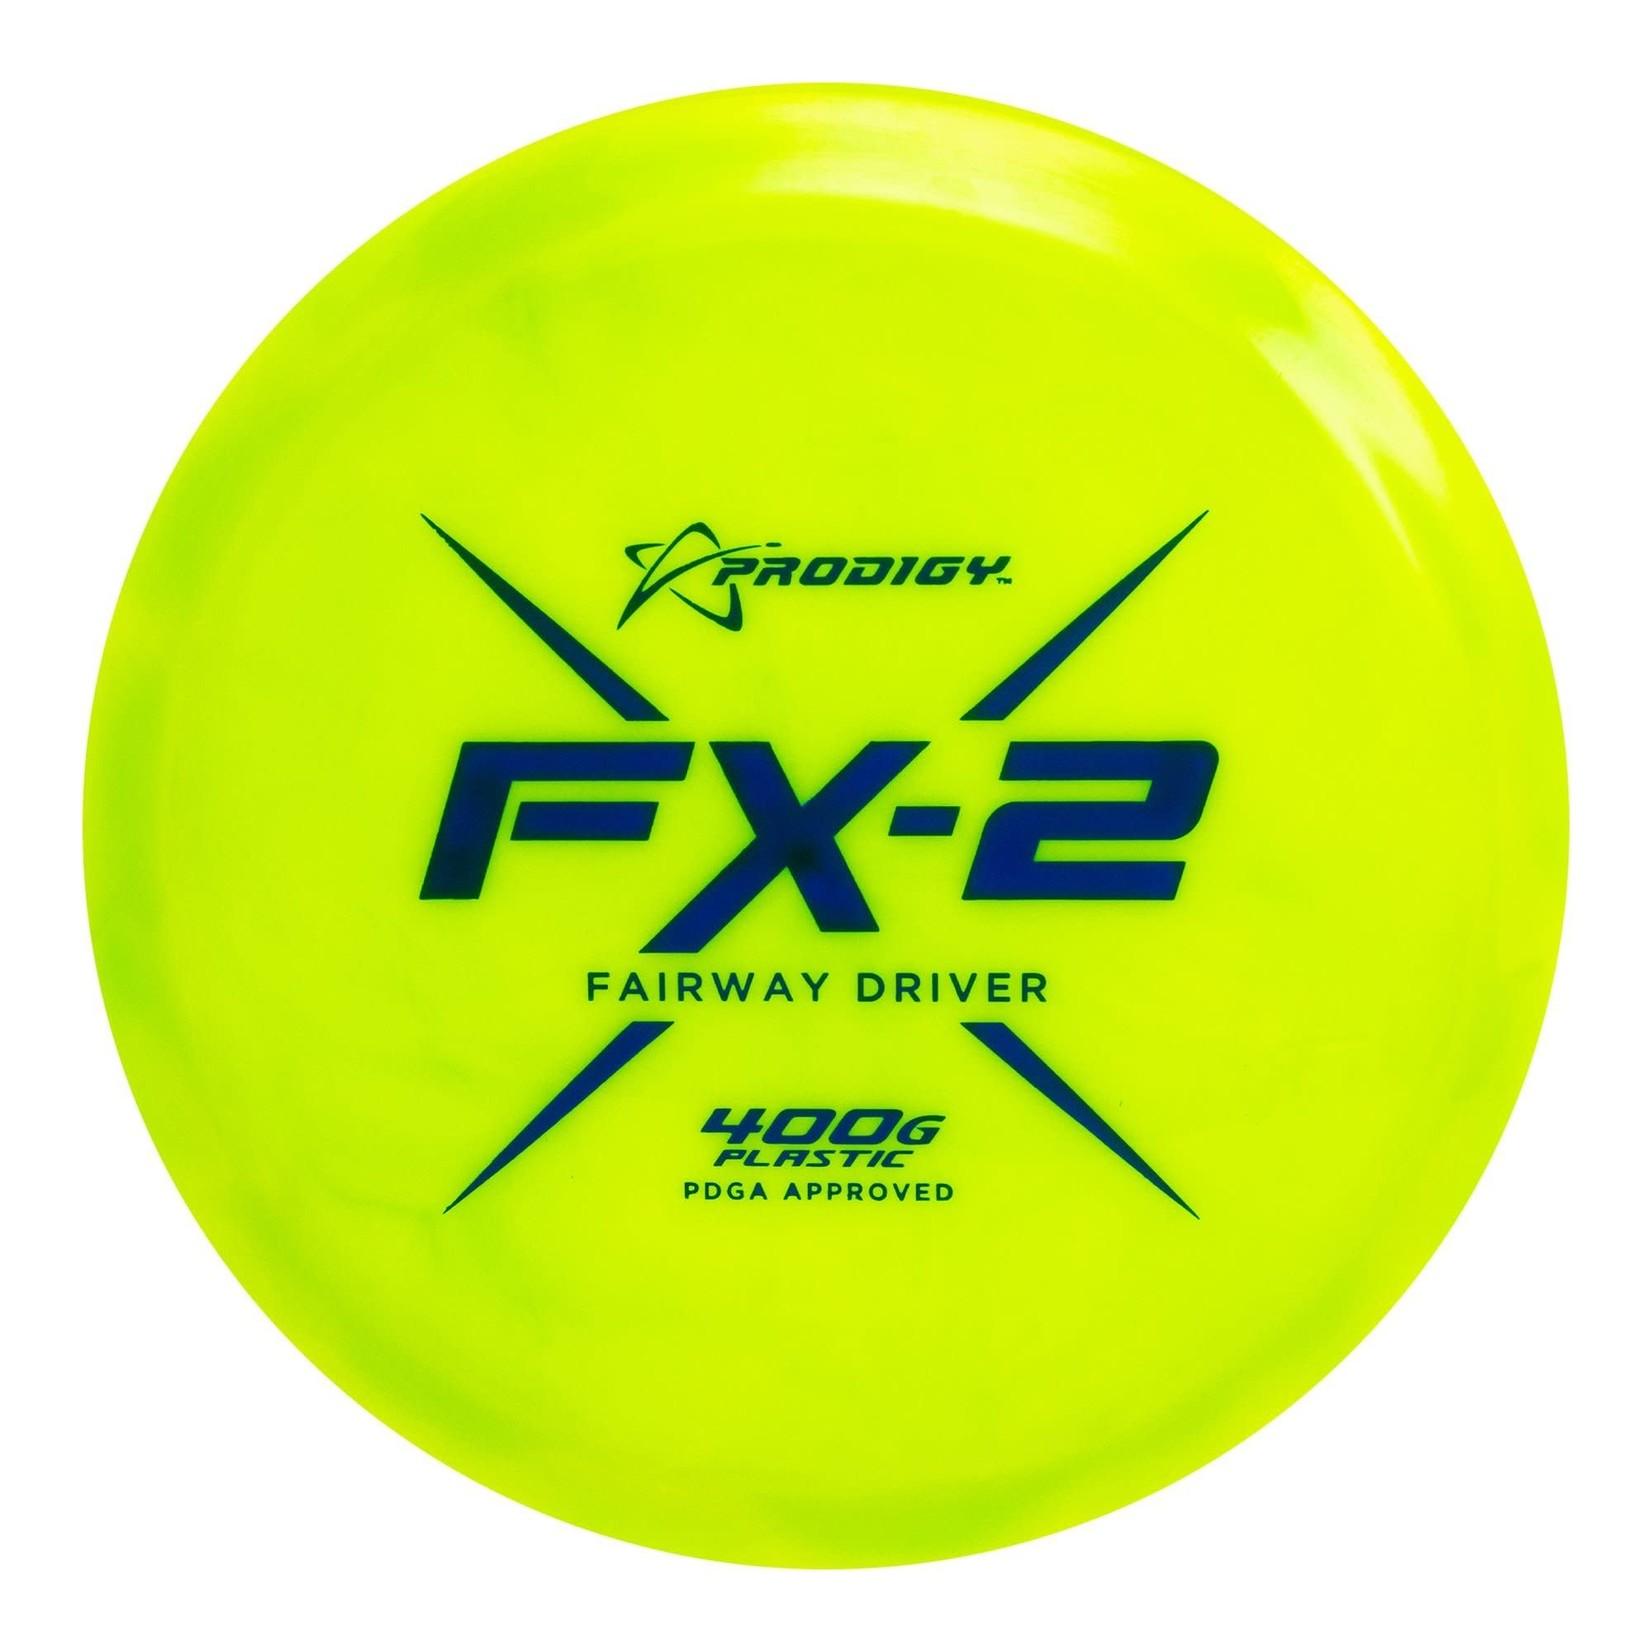 Prodigy Prodigy Disc, FX-2 Fairway Driver, FX2-4-176